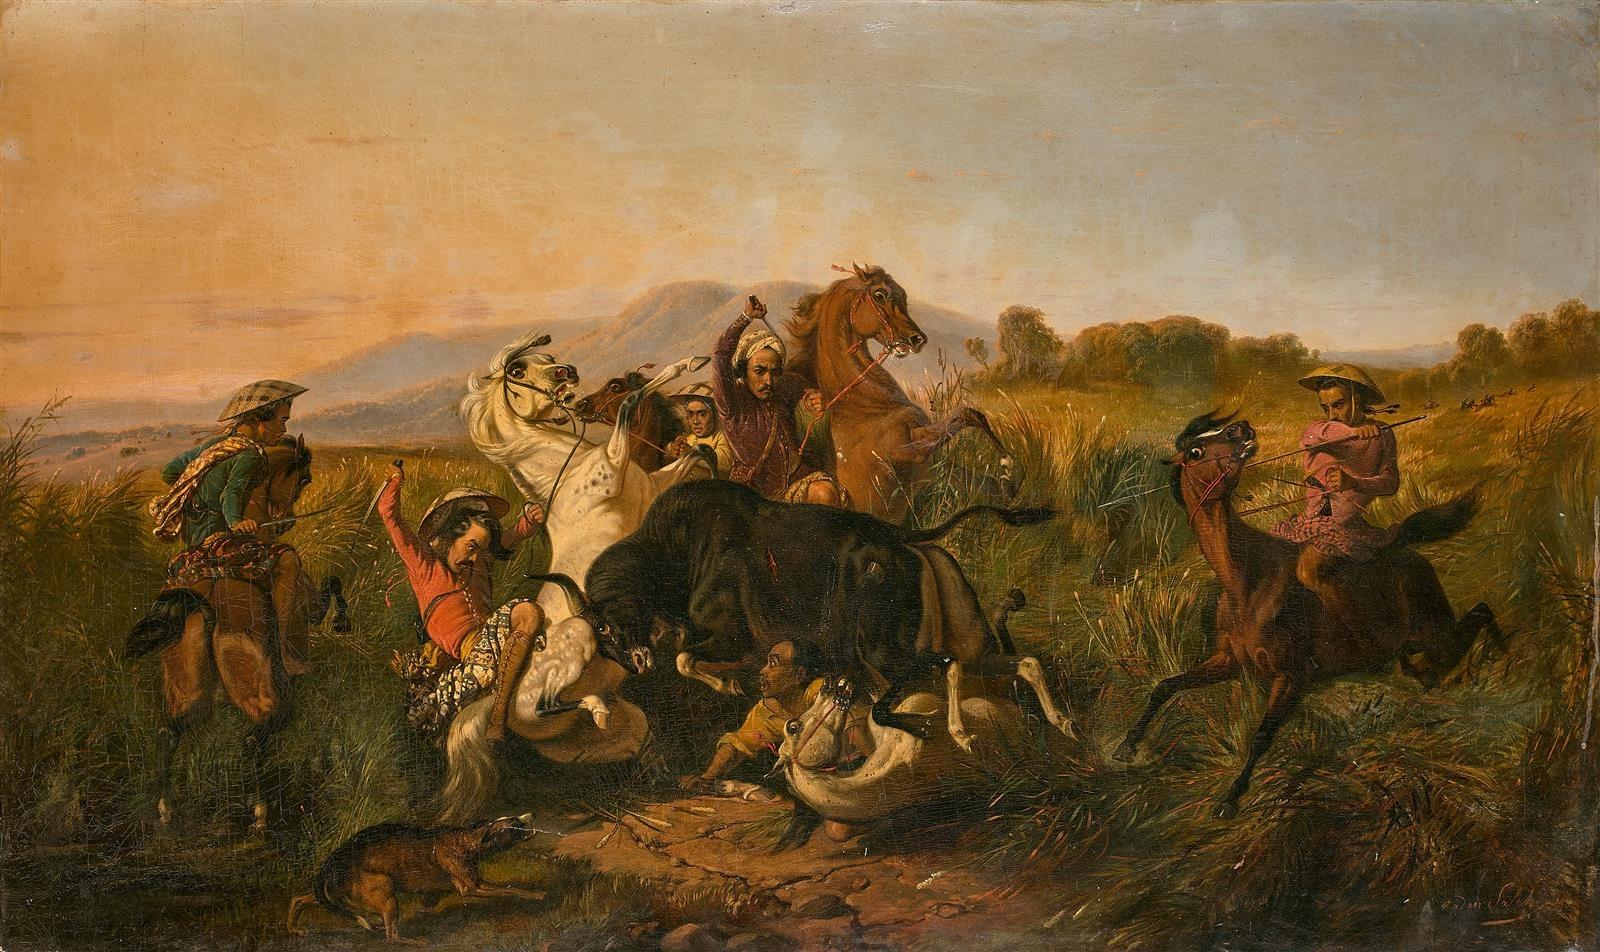 Raden Saleh (1814-1880) The Wild Bull Hunting (Banteng) (1855)